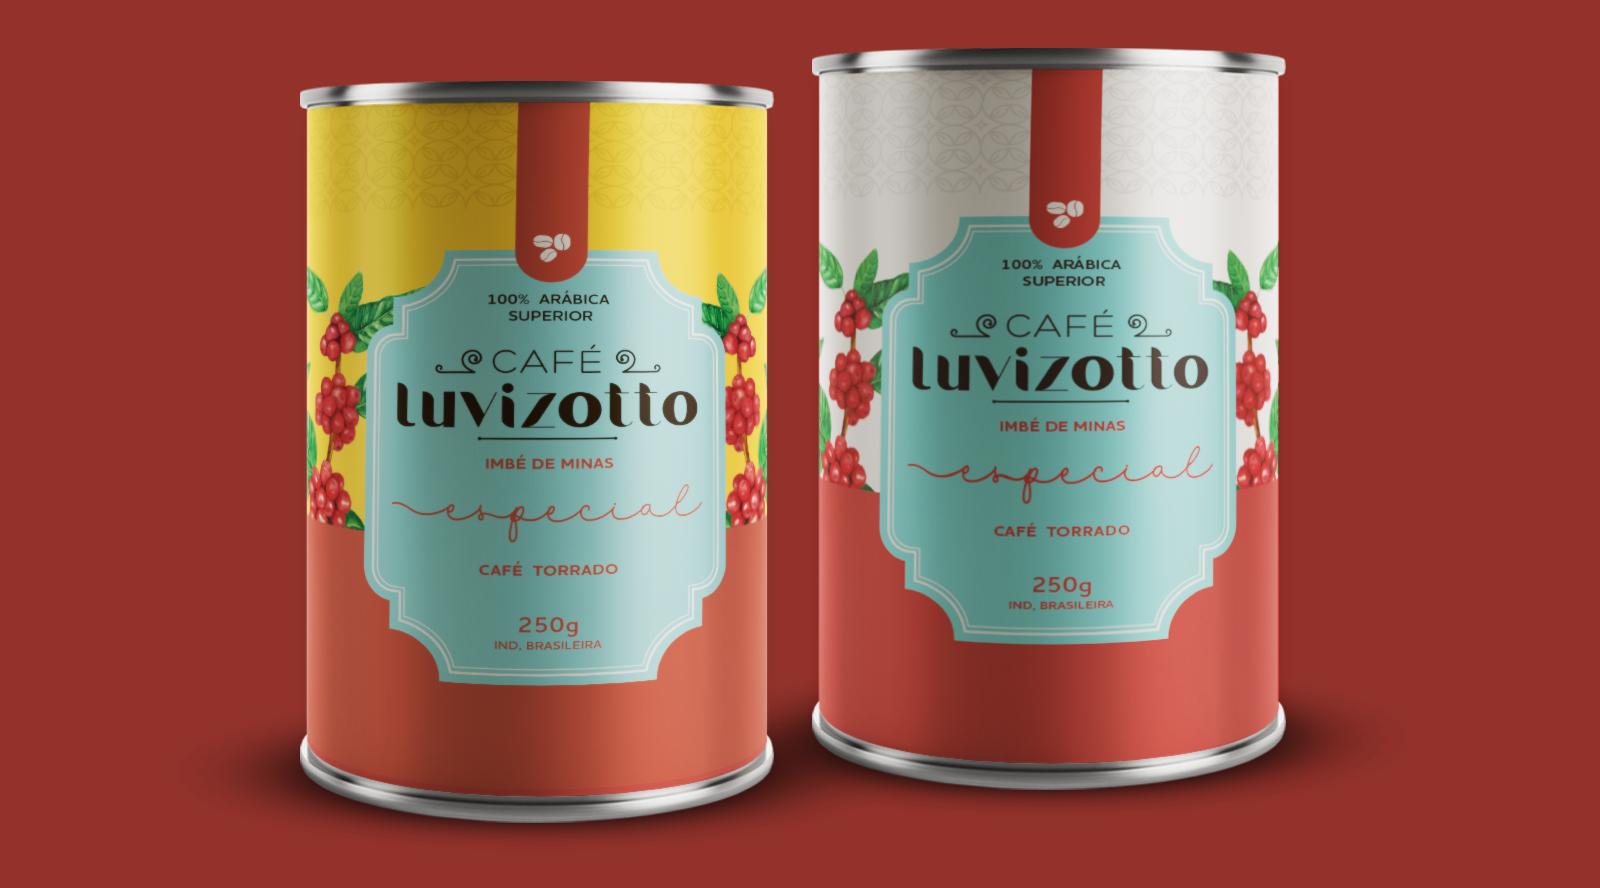 Café Luvizotto – Imagem Principal